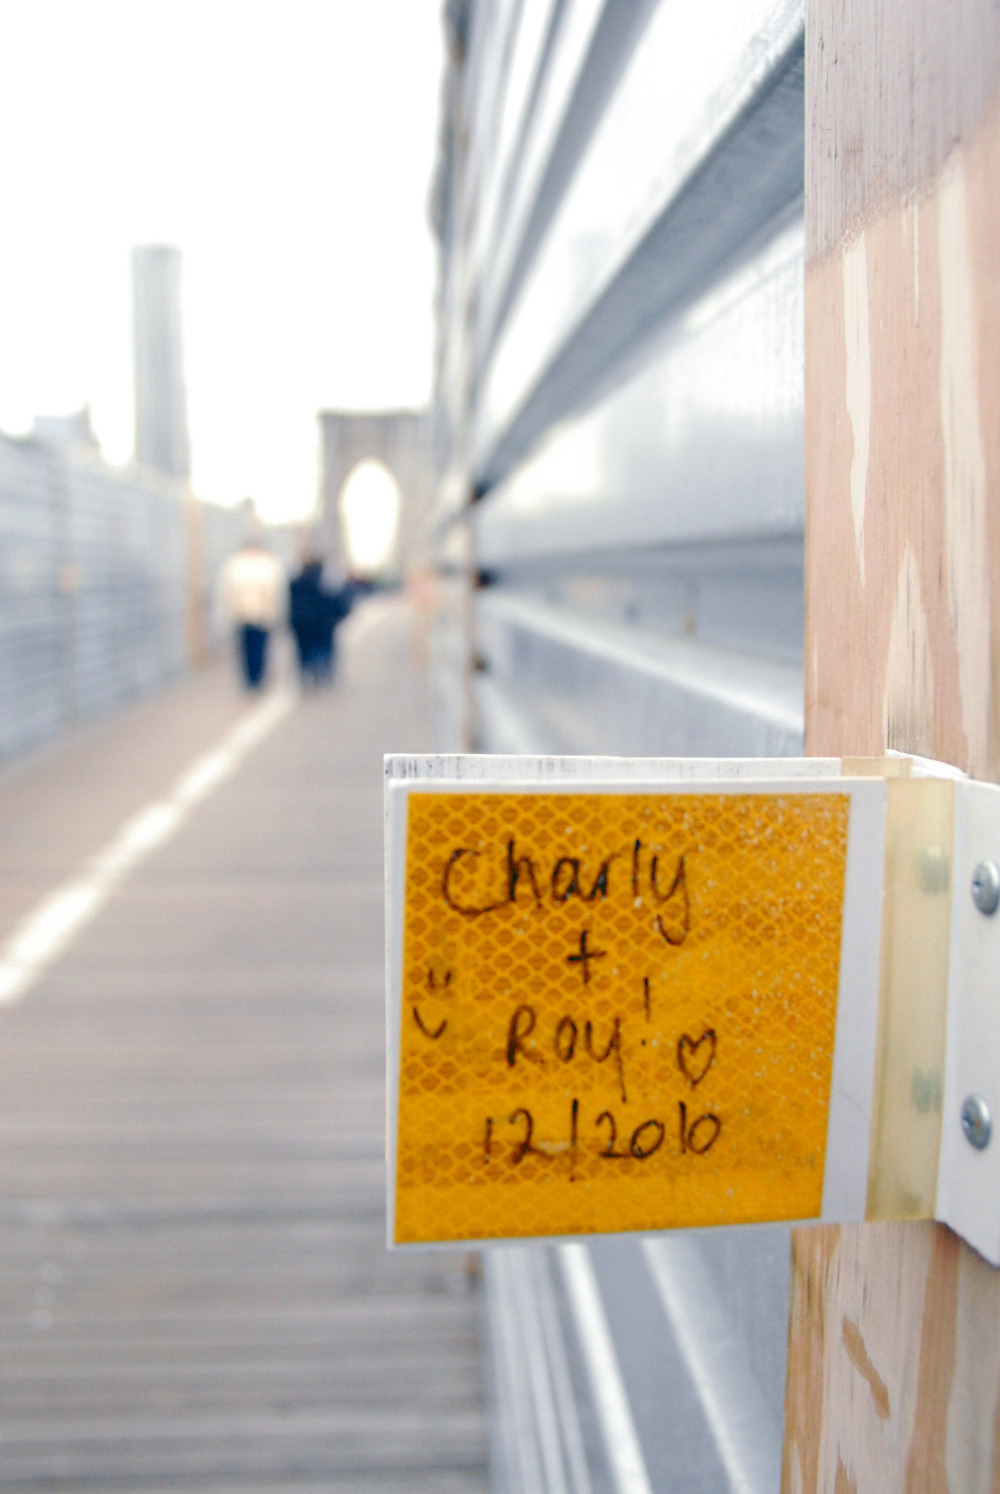 charly+roy